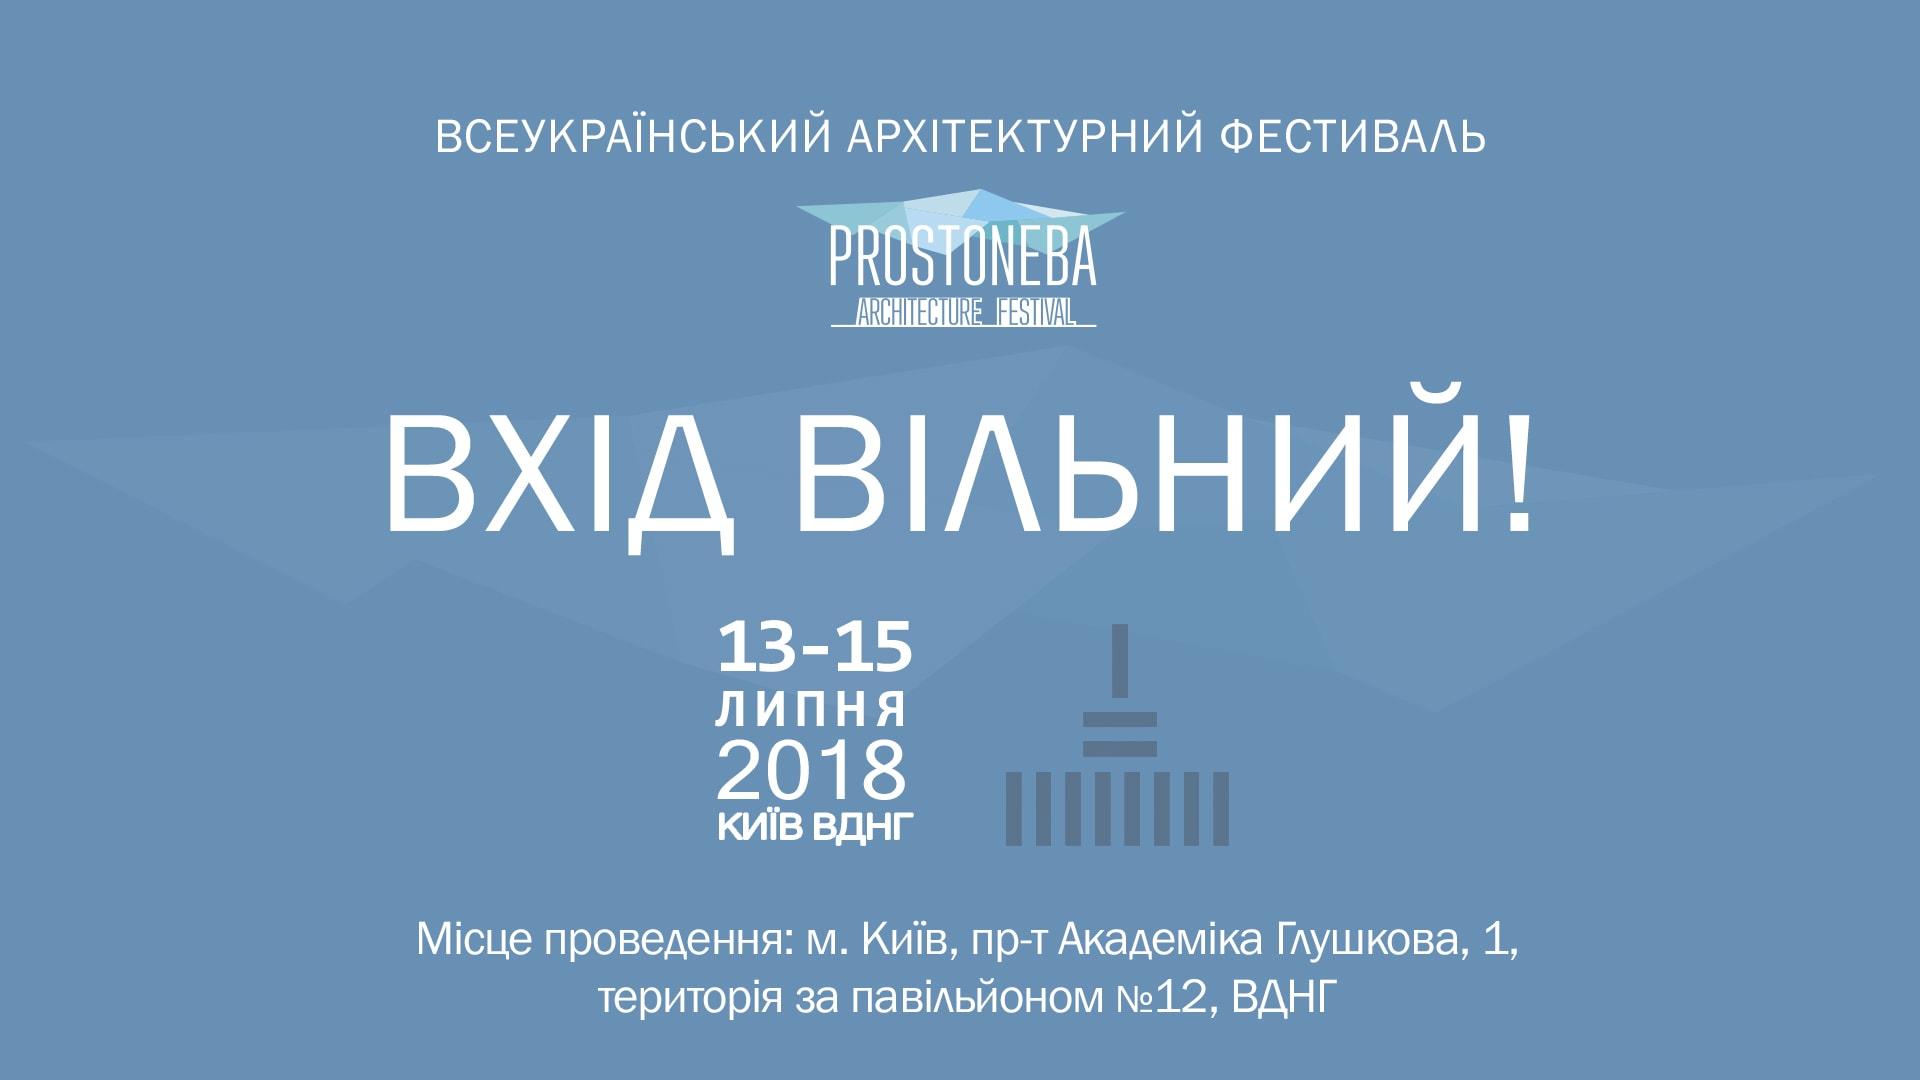 Организаторы Всеукраинского архитектурного фестиваля PROSTONEBA опубликовали программу ивента - PRAGMATIKA.MEDIA